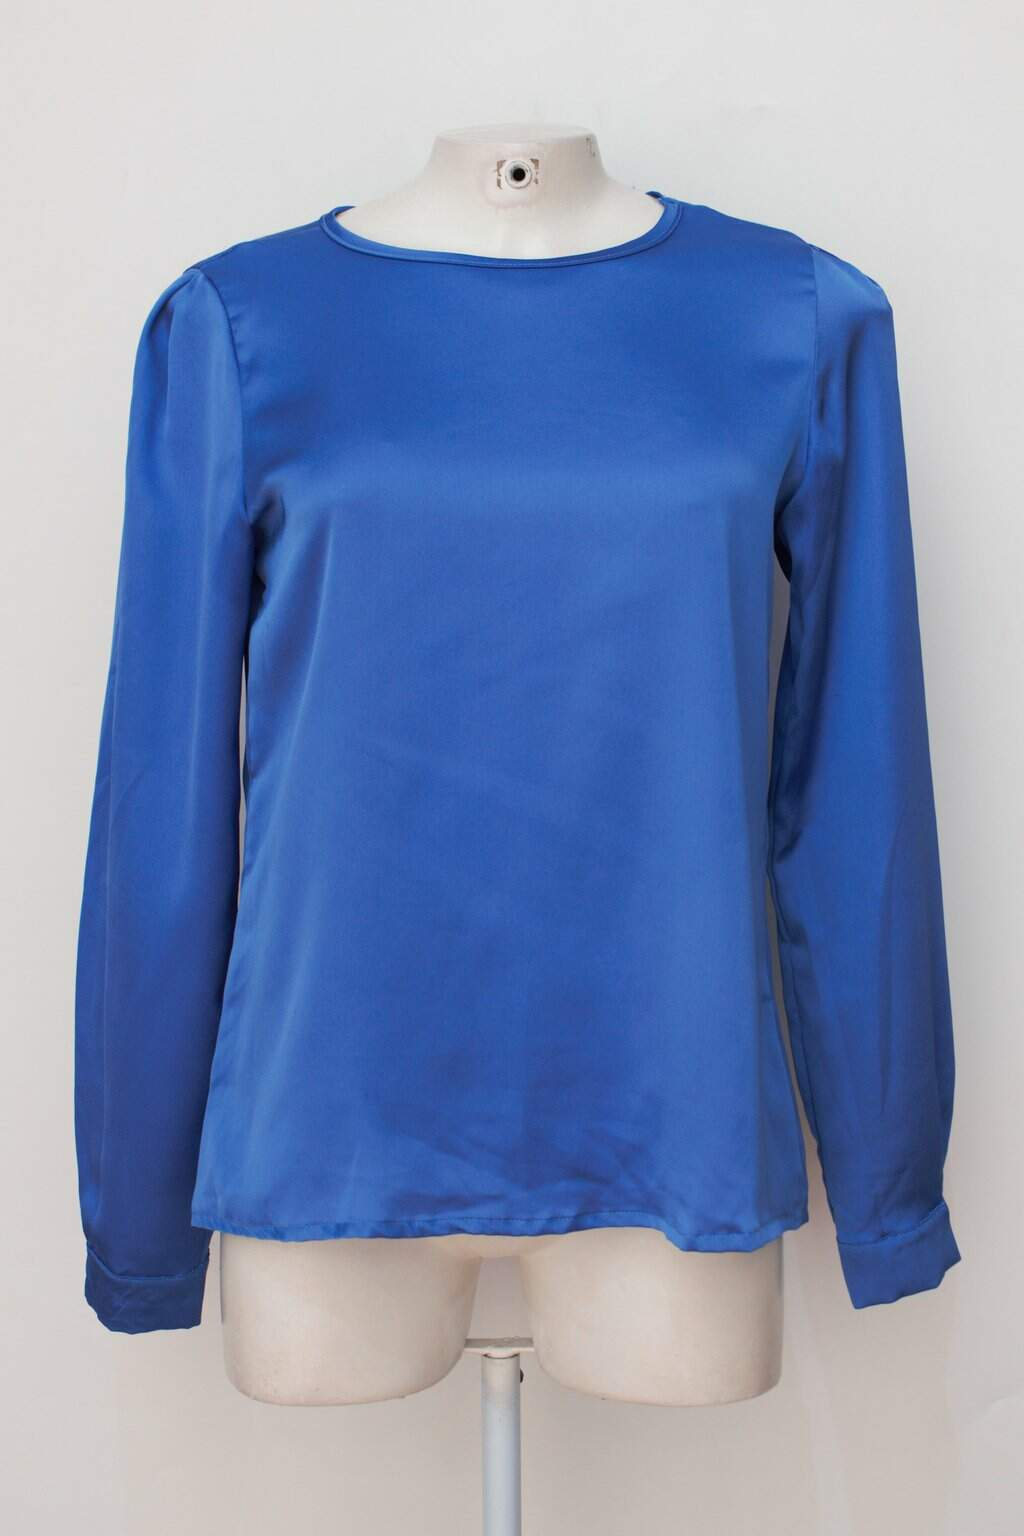 Blusa azul dmetal